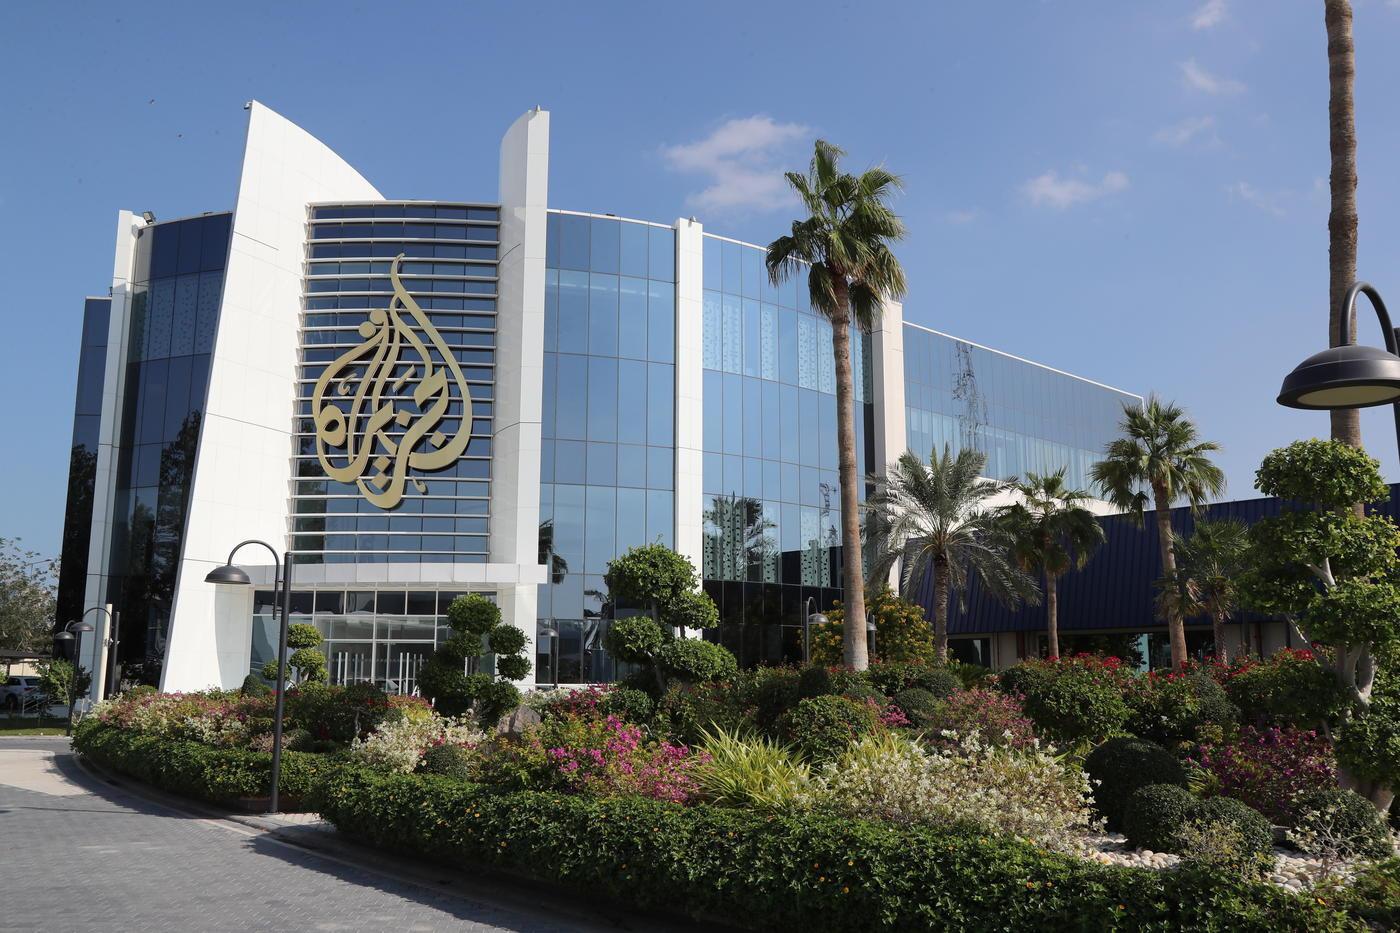 REVEALED: The real reasons why Qatar shut down Al Jazeera Turk